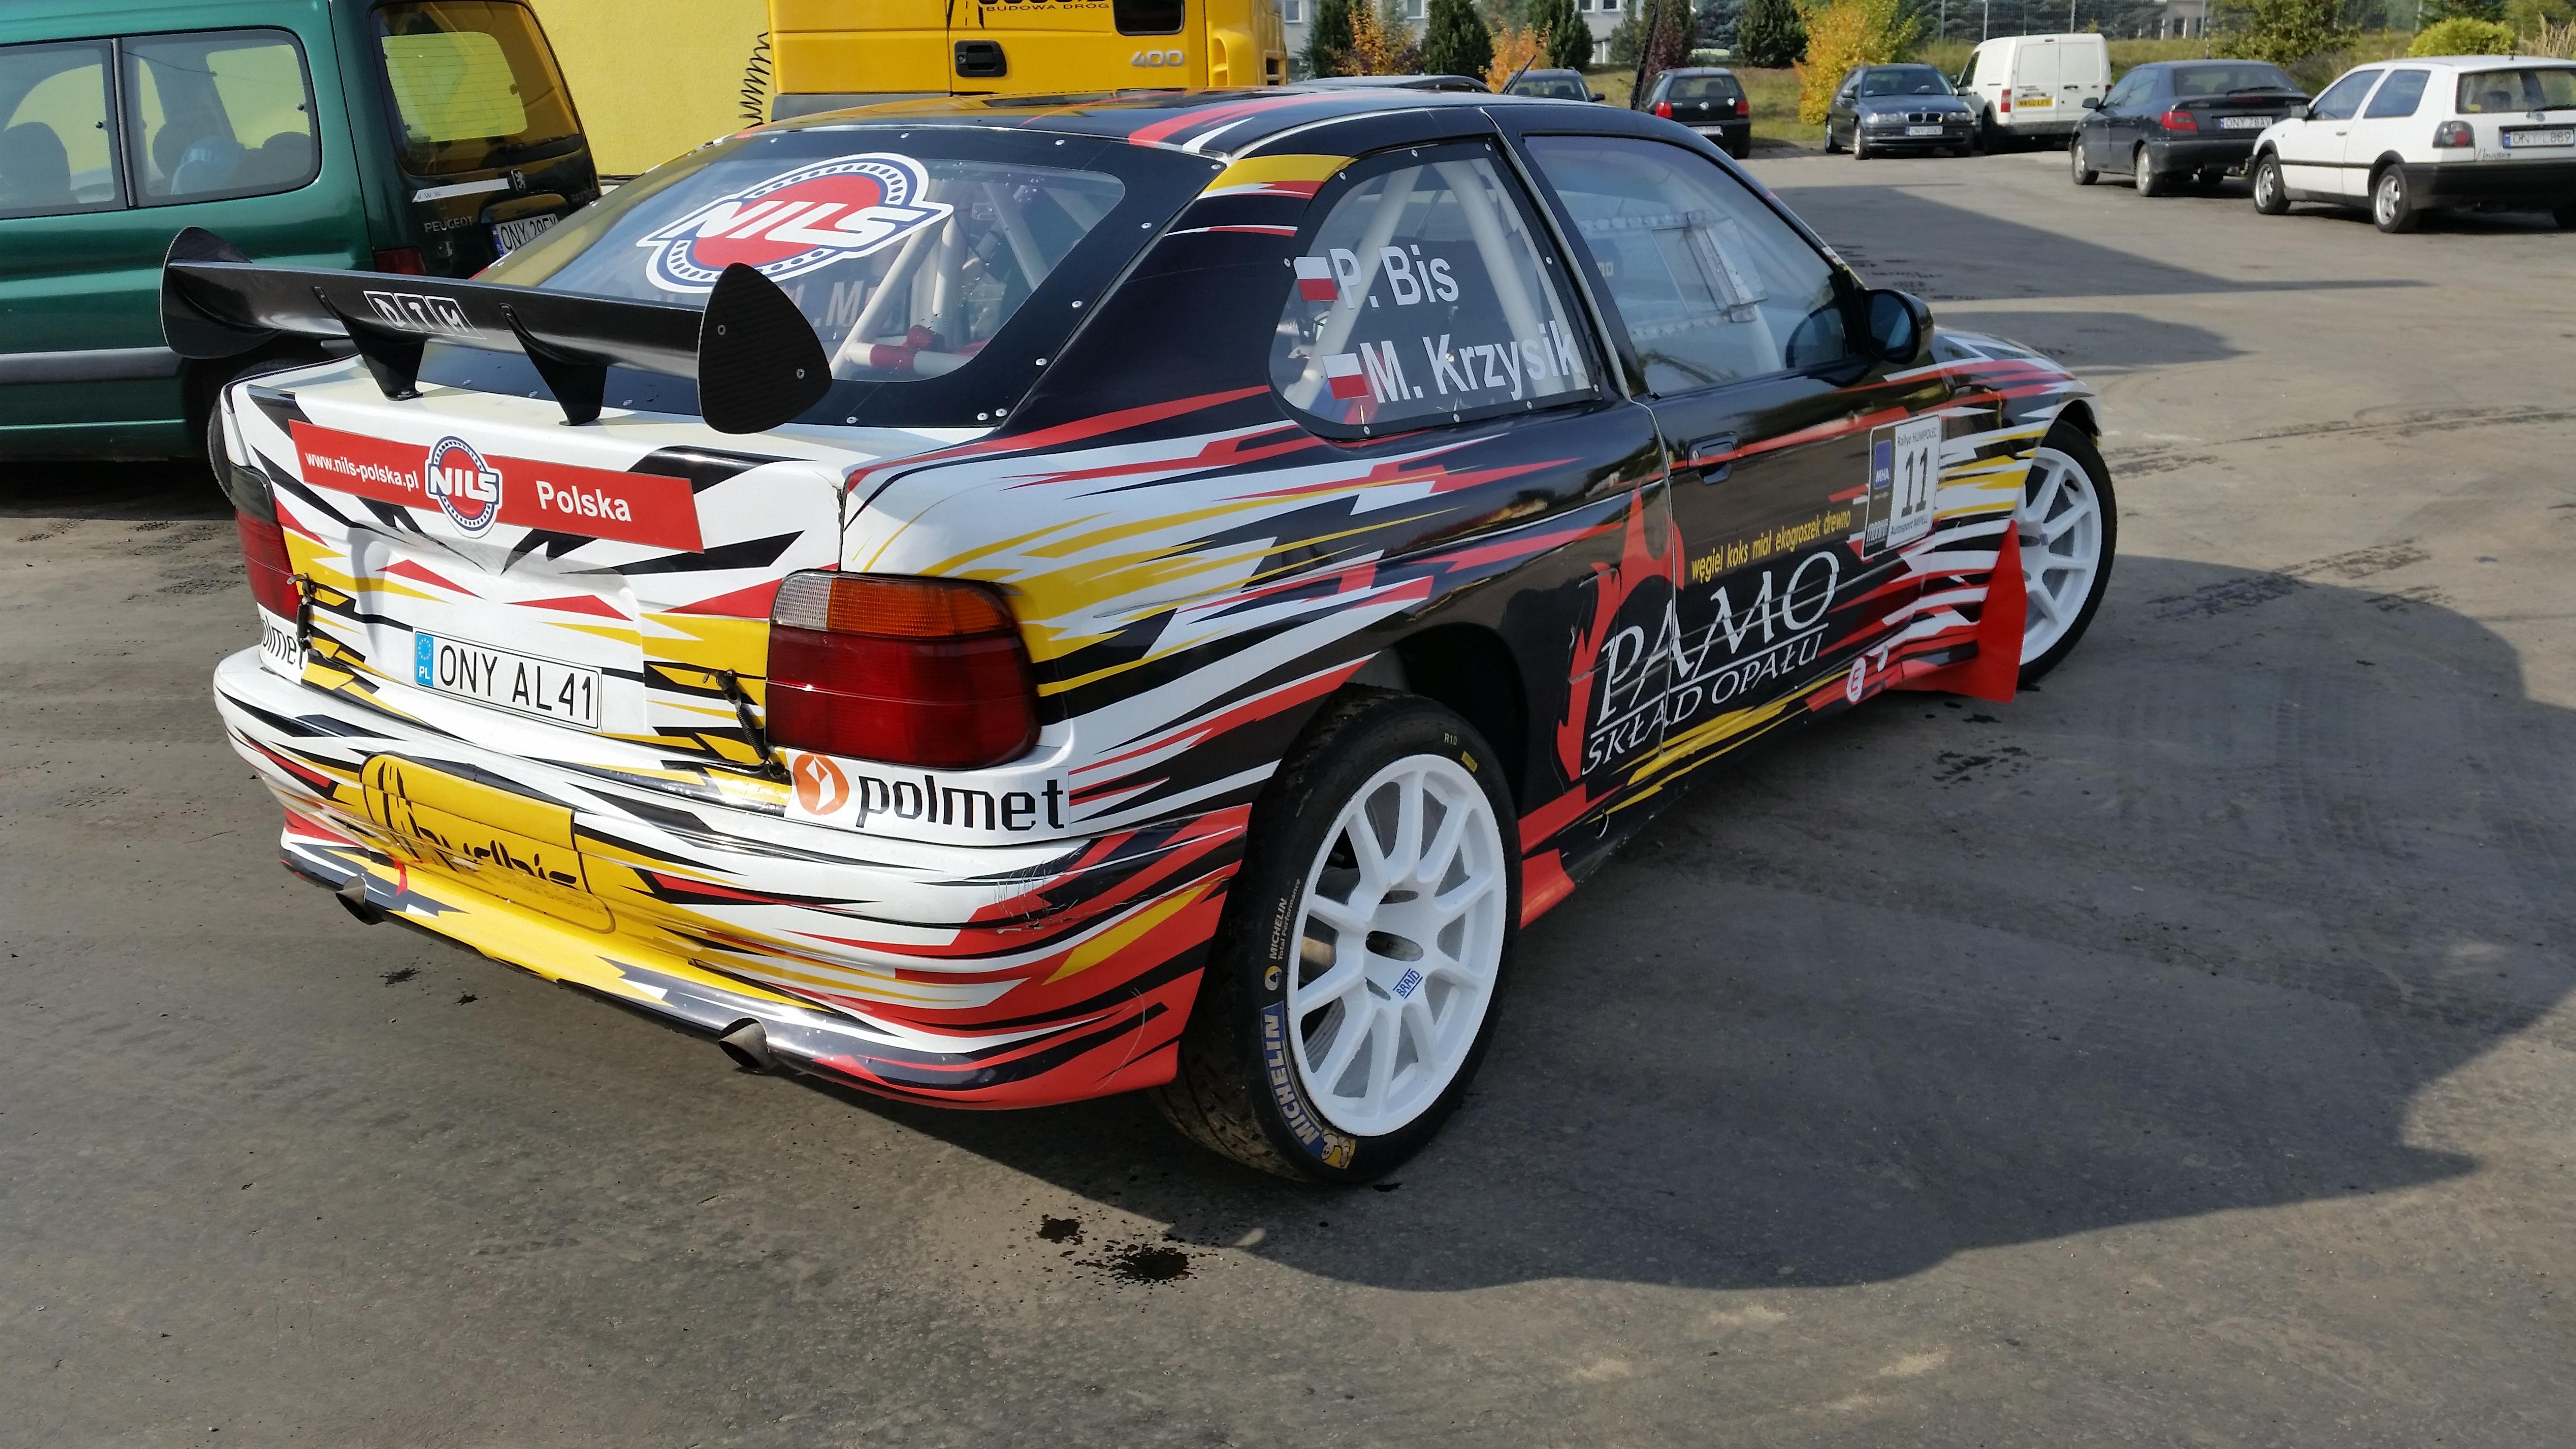 bmw compact  rally gr  rally cars  sale  raced rallied rally cars  sale race